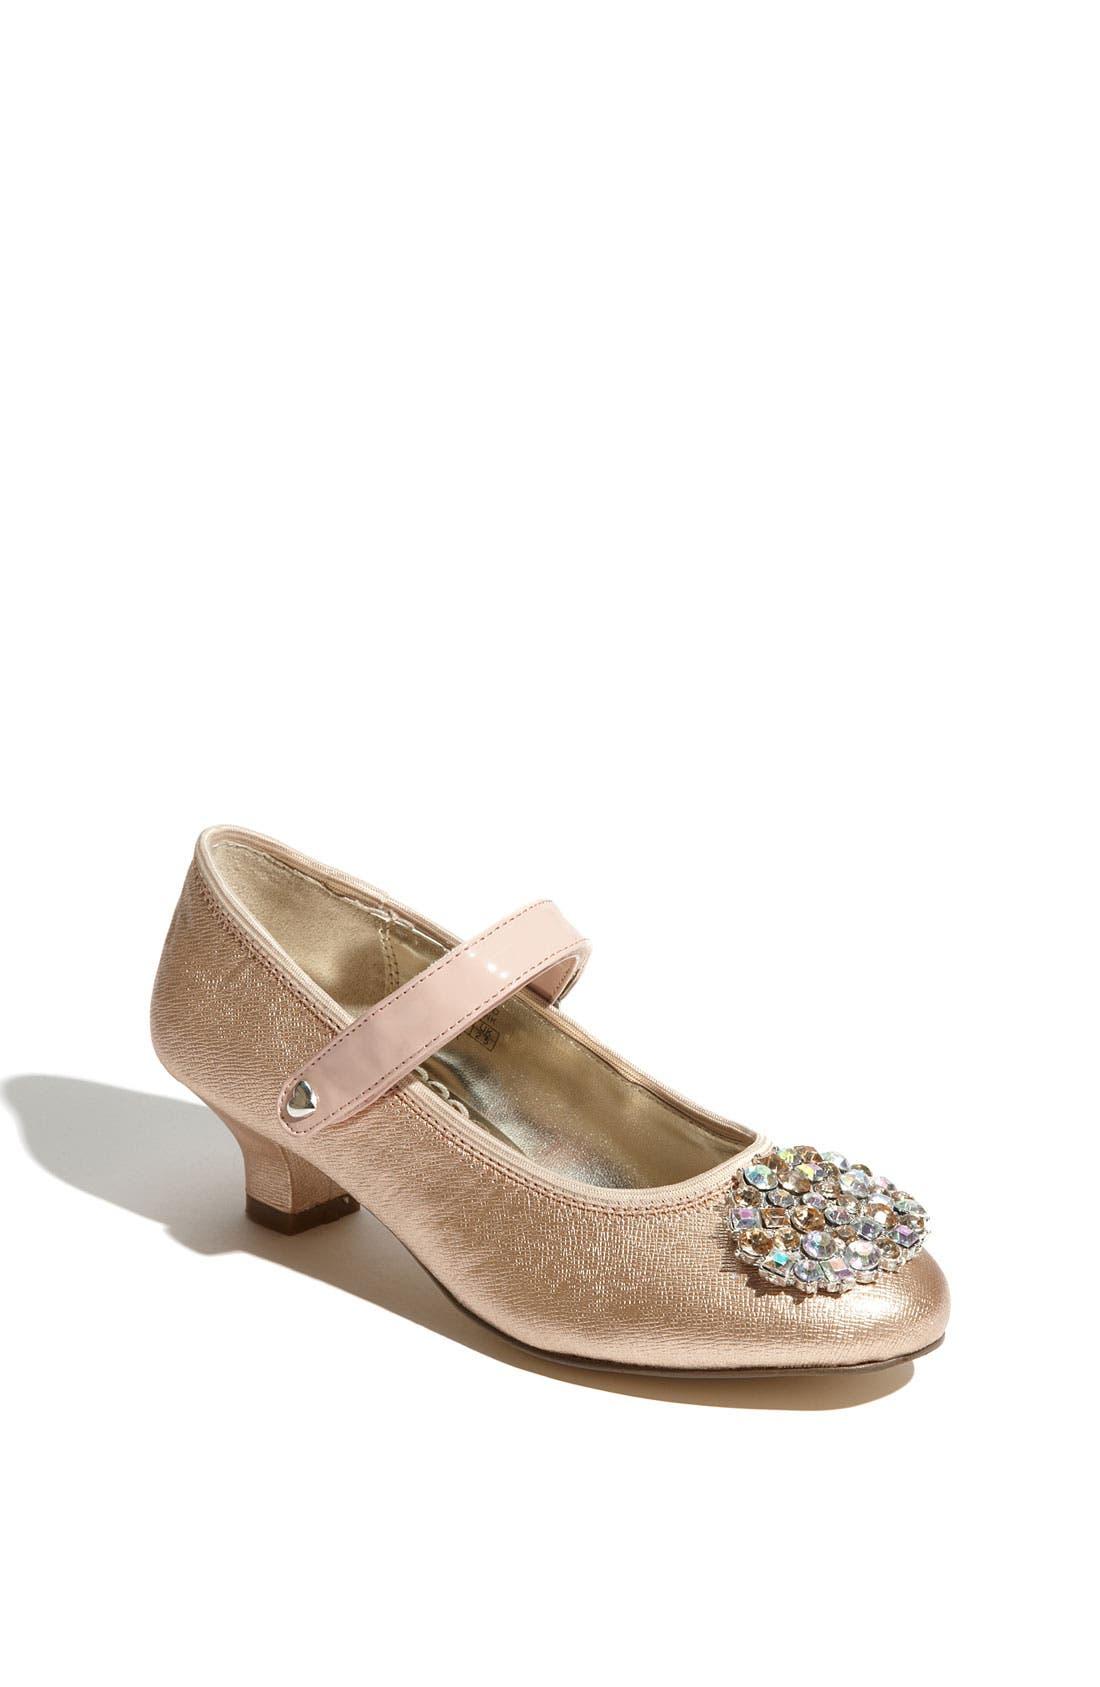 Alternate Image 1 Selected - Juicy Couture 'Phoebe' Shoe (Toddler, Little Kid & Big Kid)